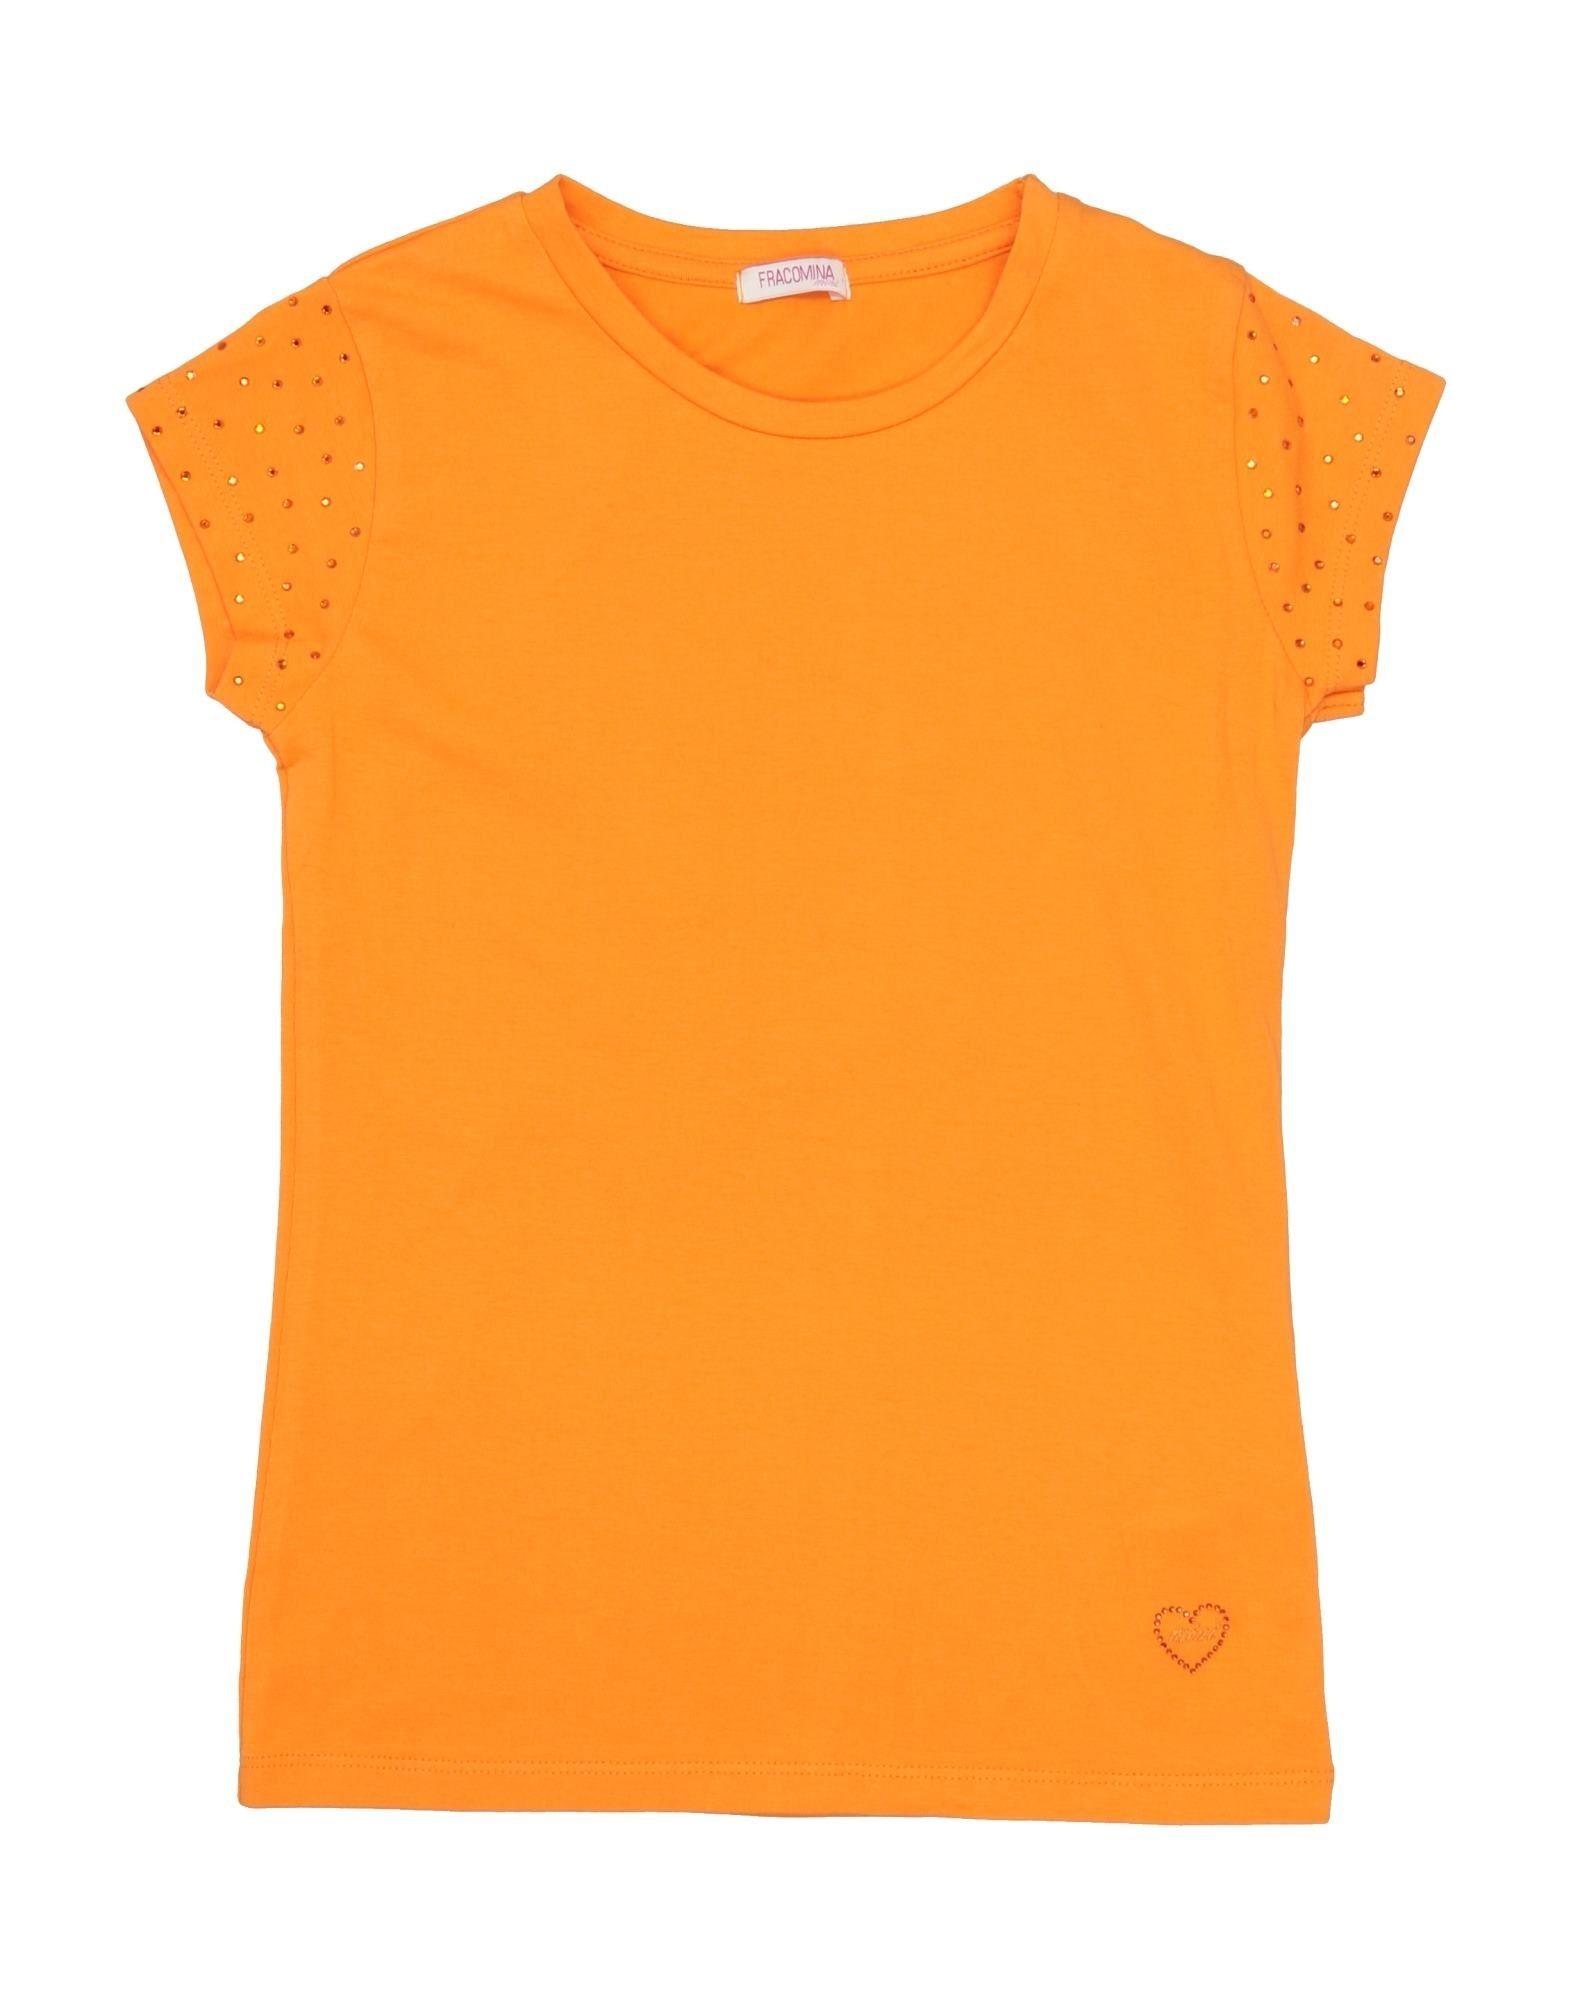 Fracomina Mini Kids' T-shirts In Orange